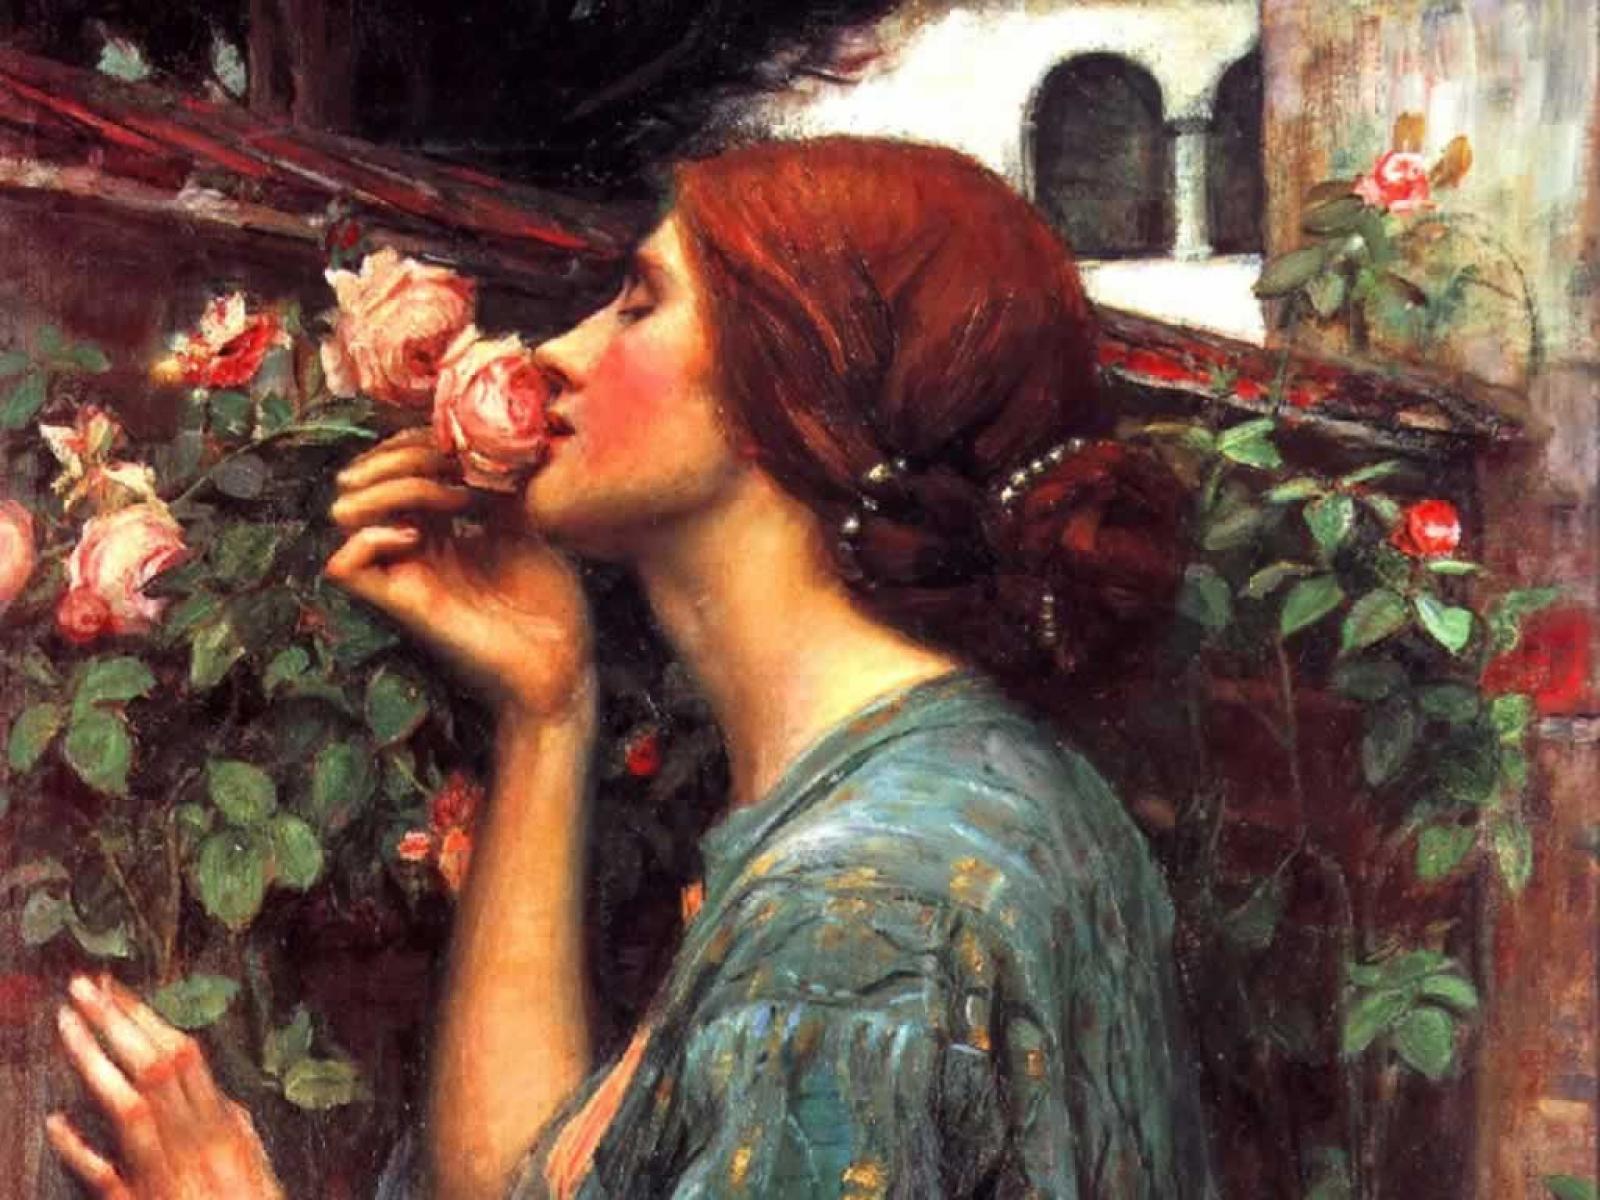 pre-raphaelite art - Pre-Raphaelite Art Photo (23219457) - Fanpop